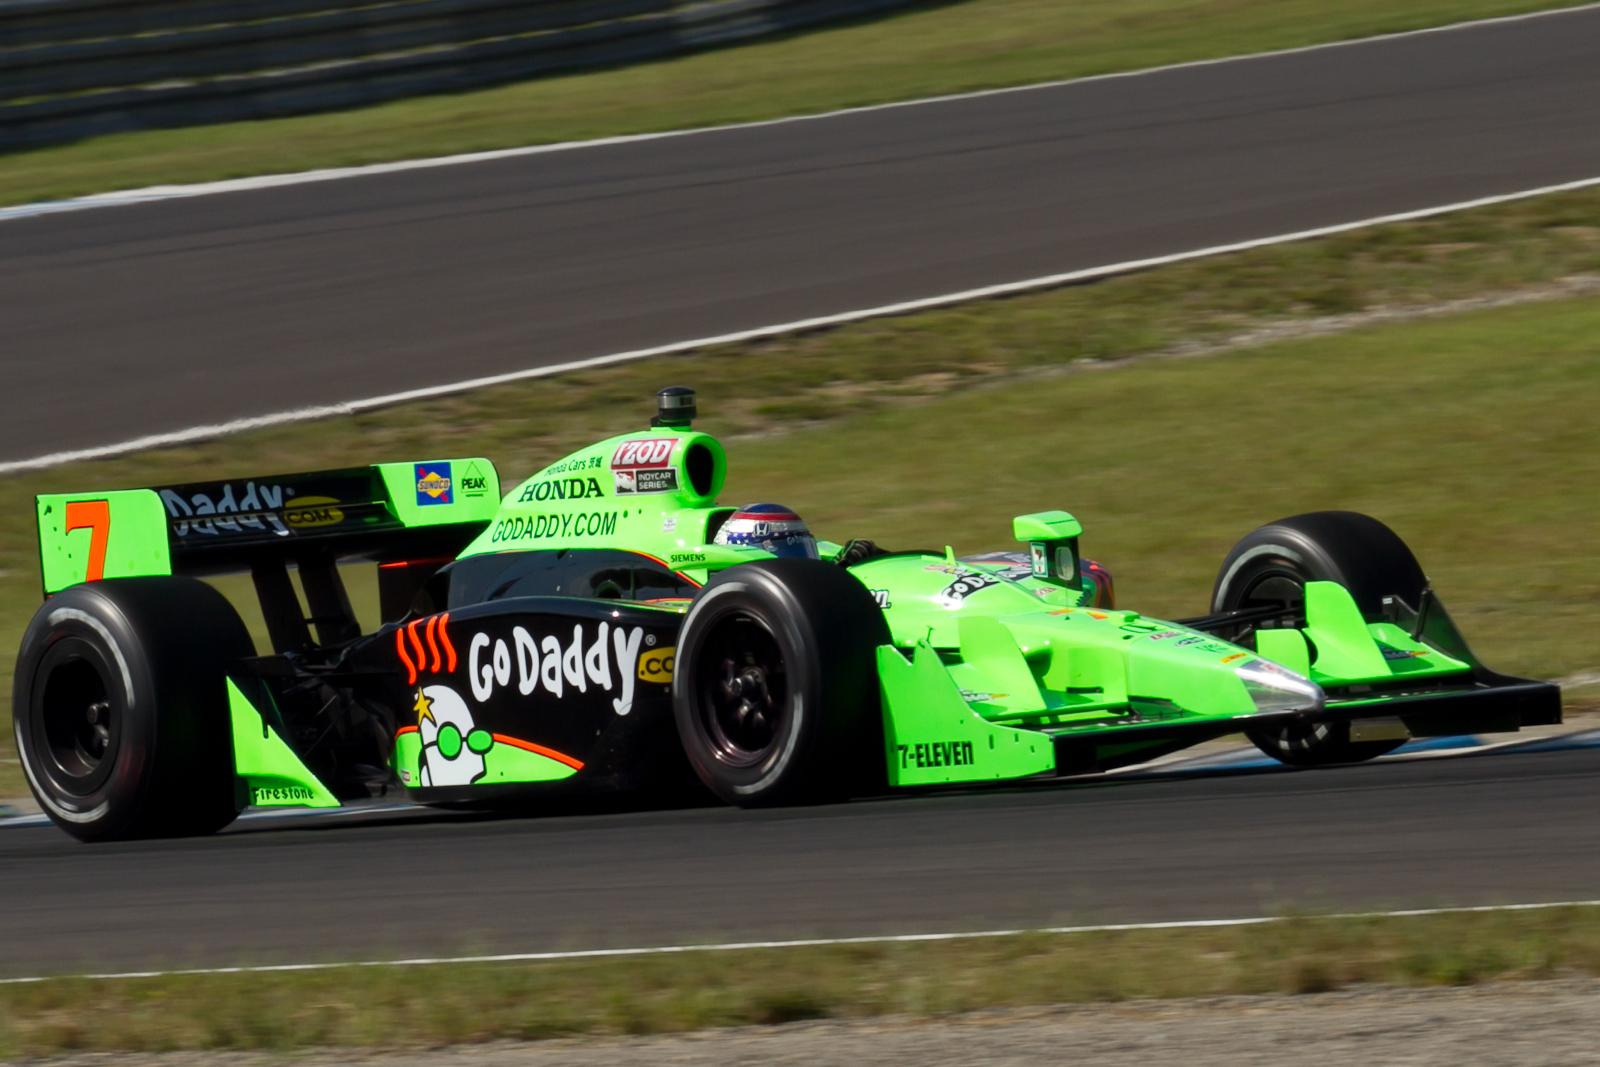 Danica_Patrick_2011_Indy_Japan_300_Race.jpg